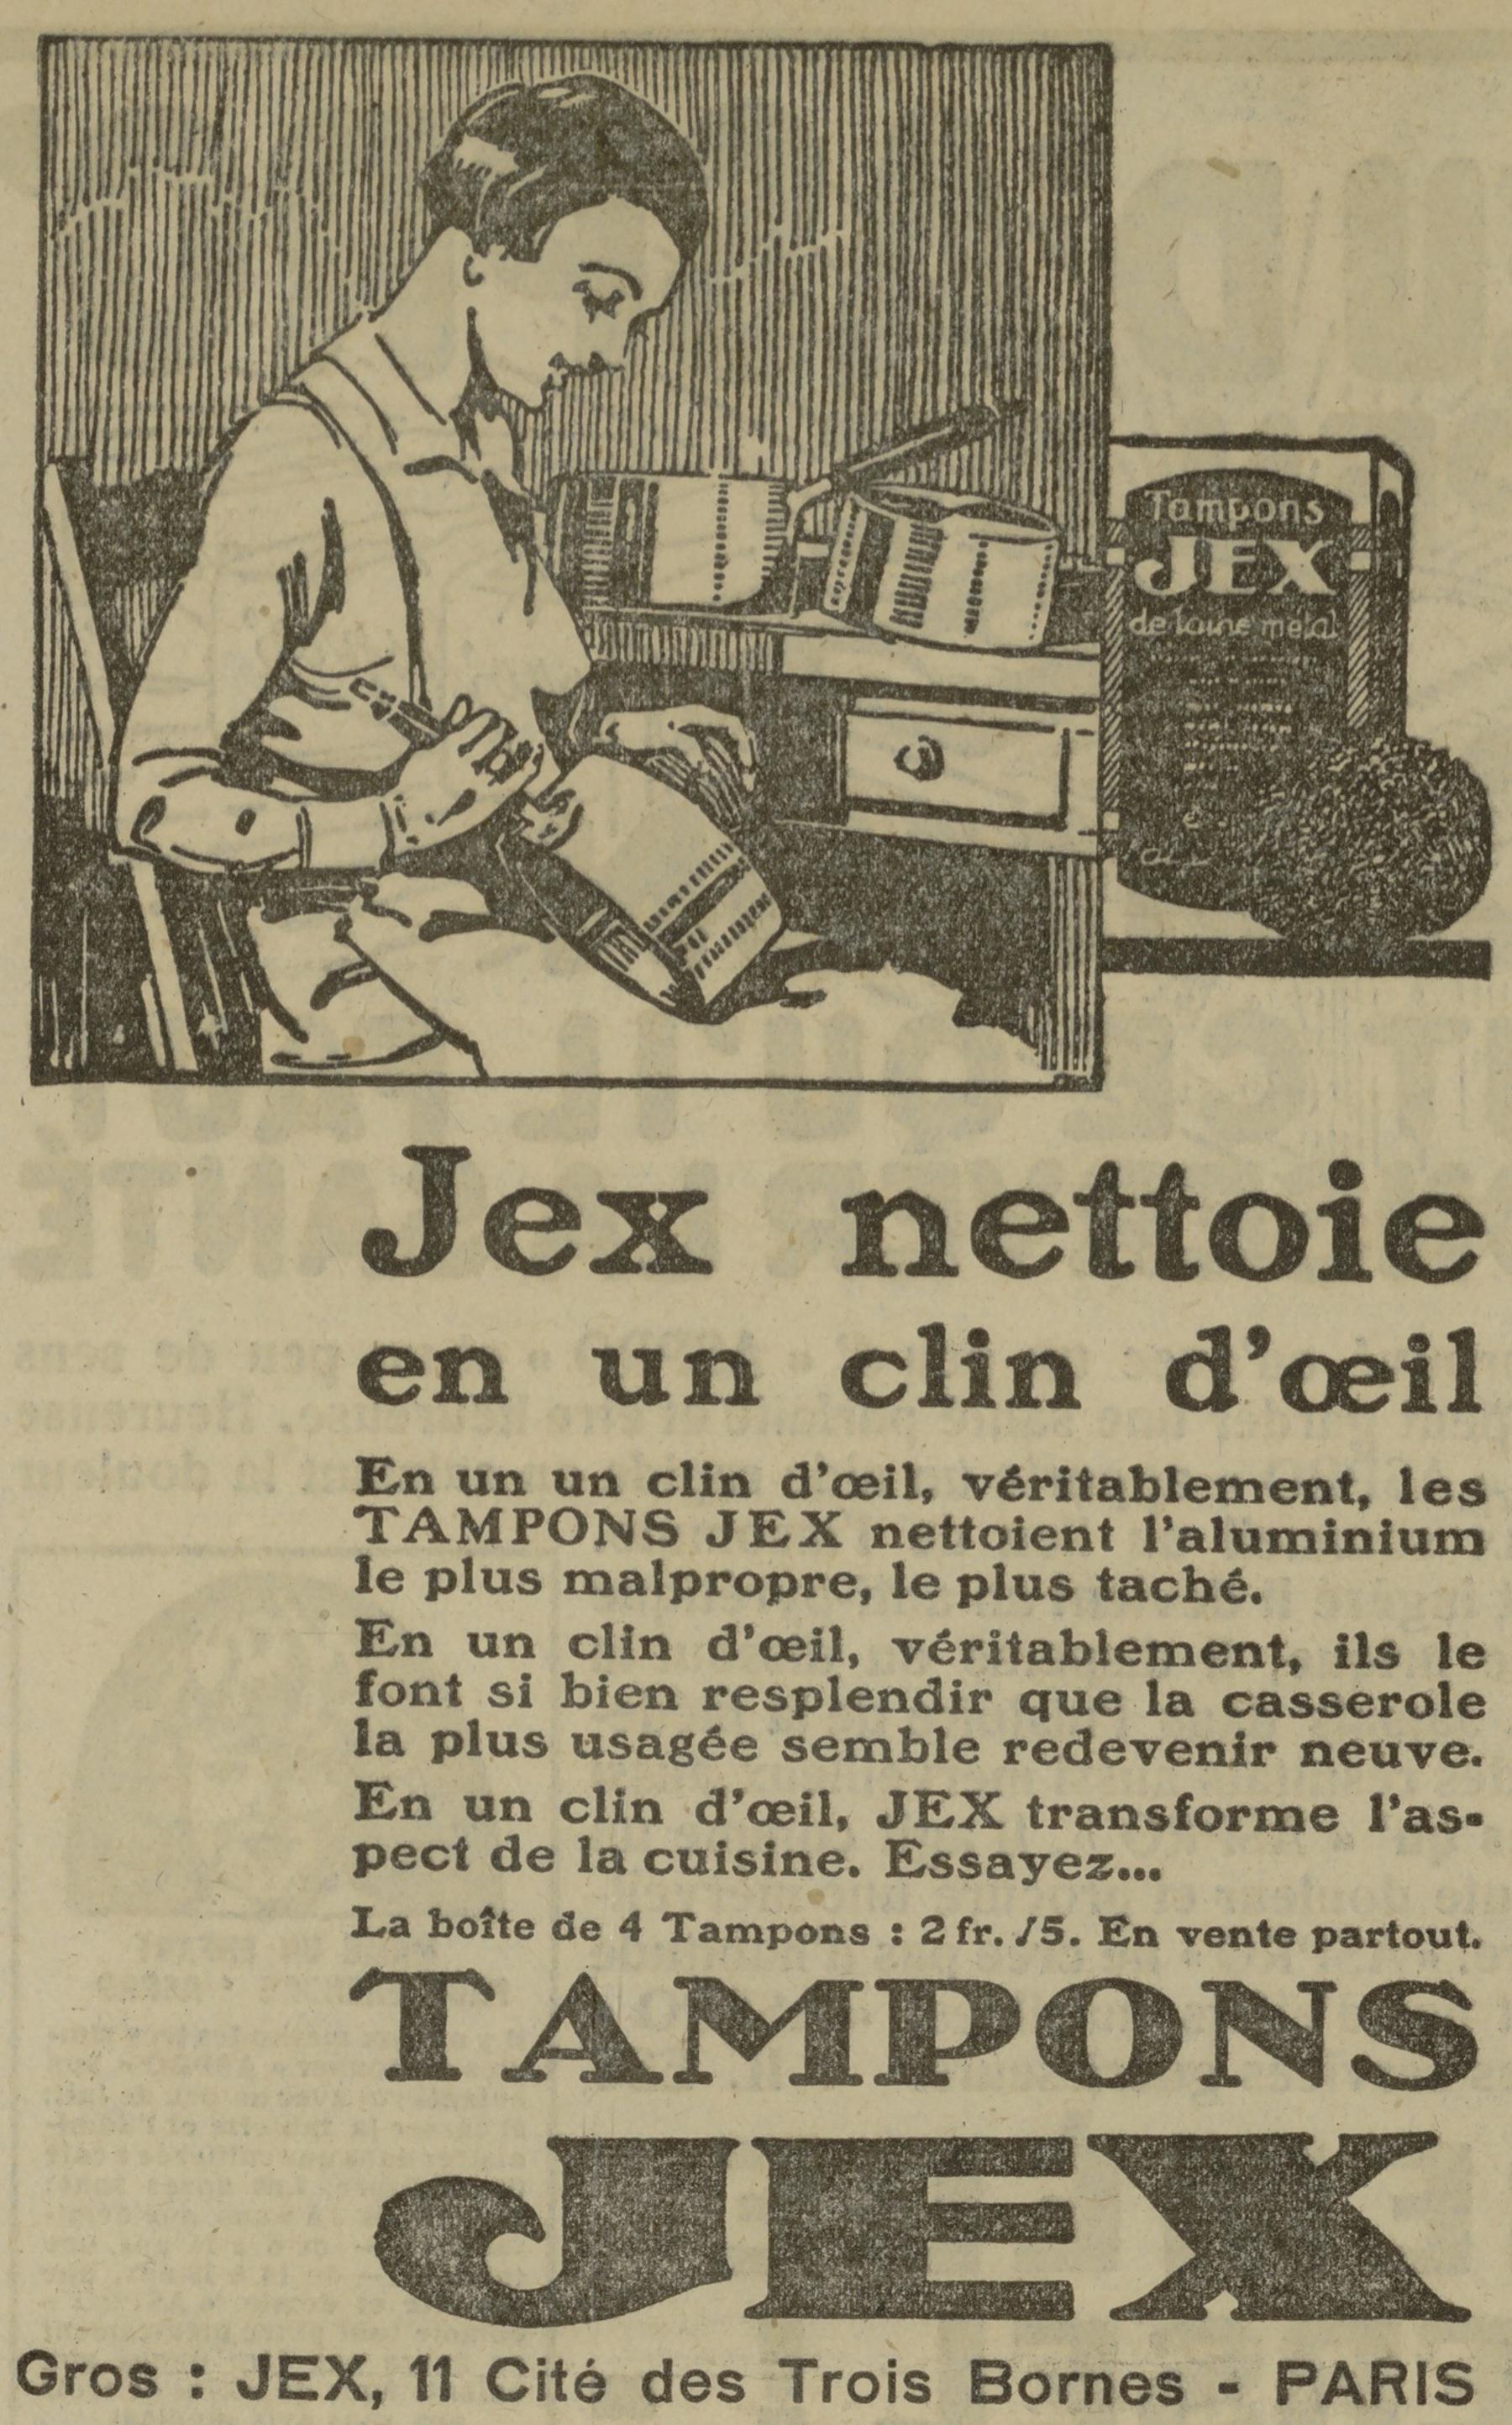 Contenu du tampons Jex